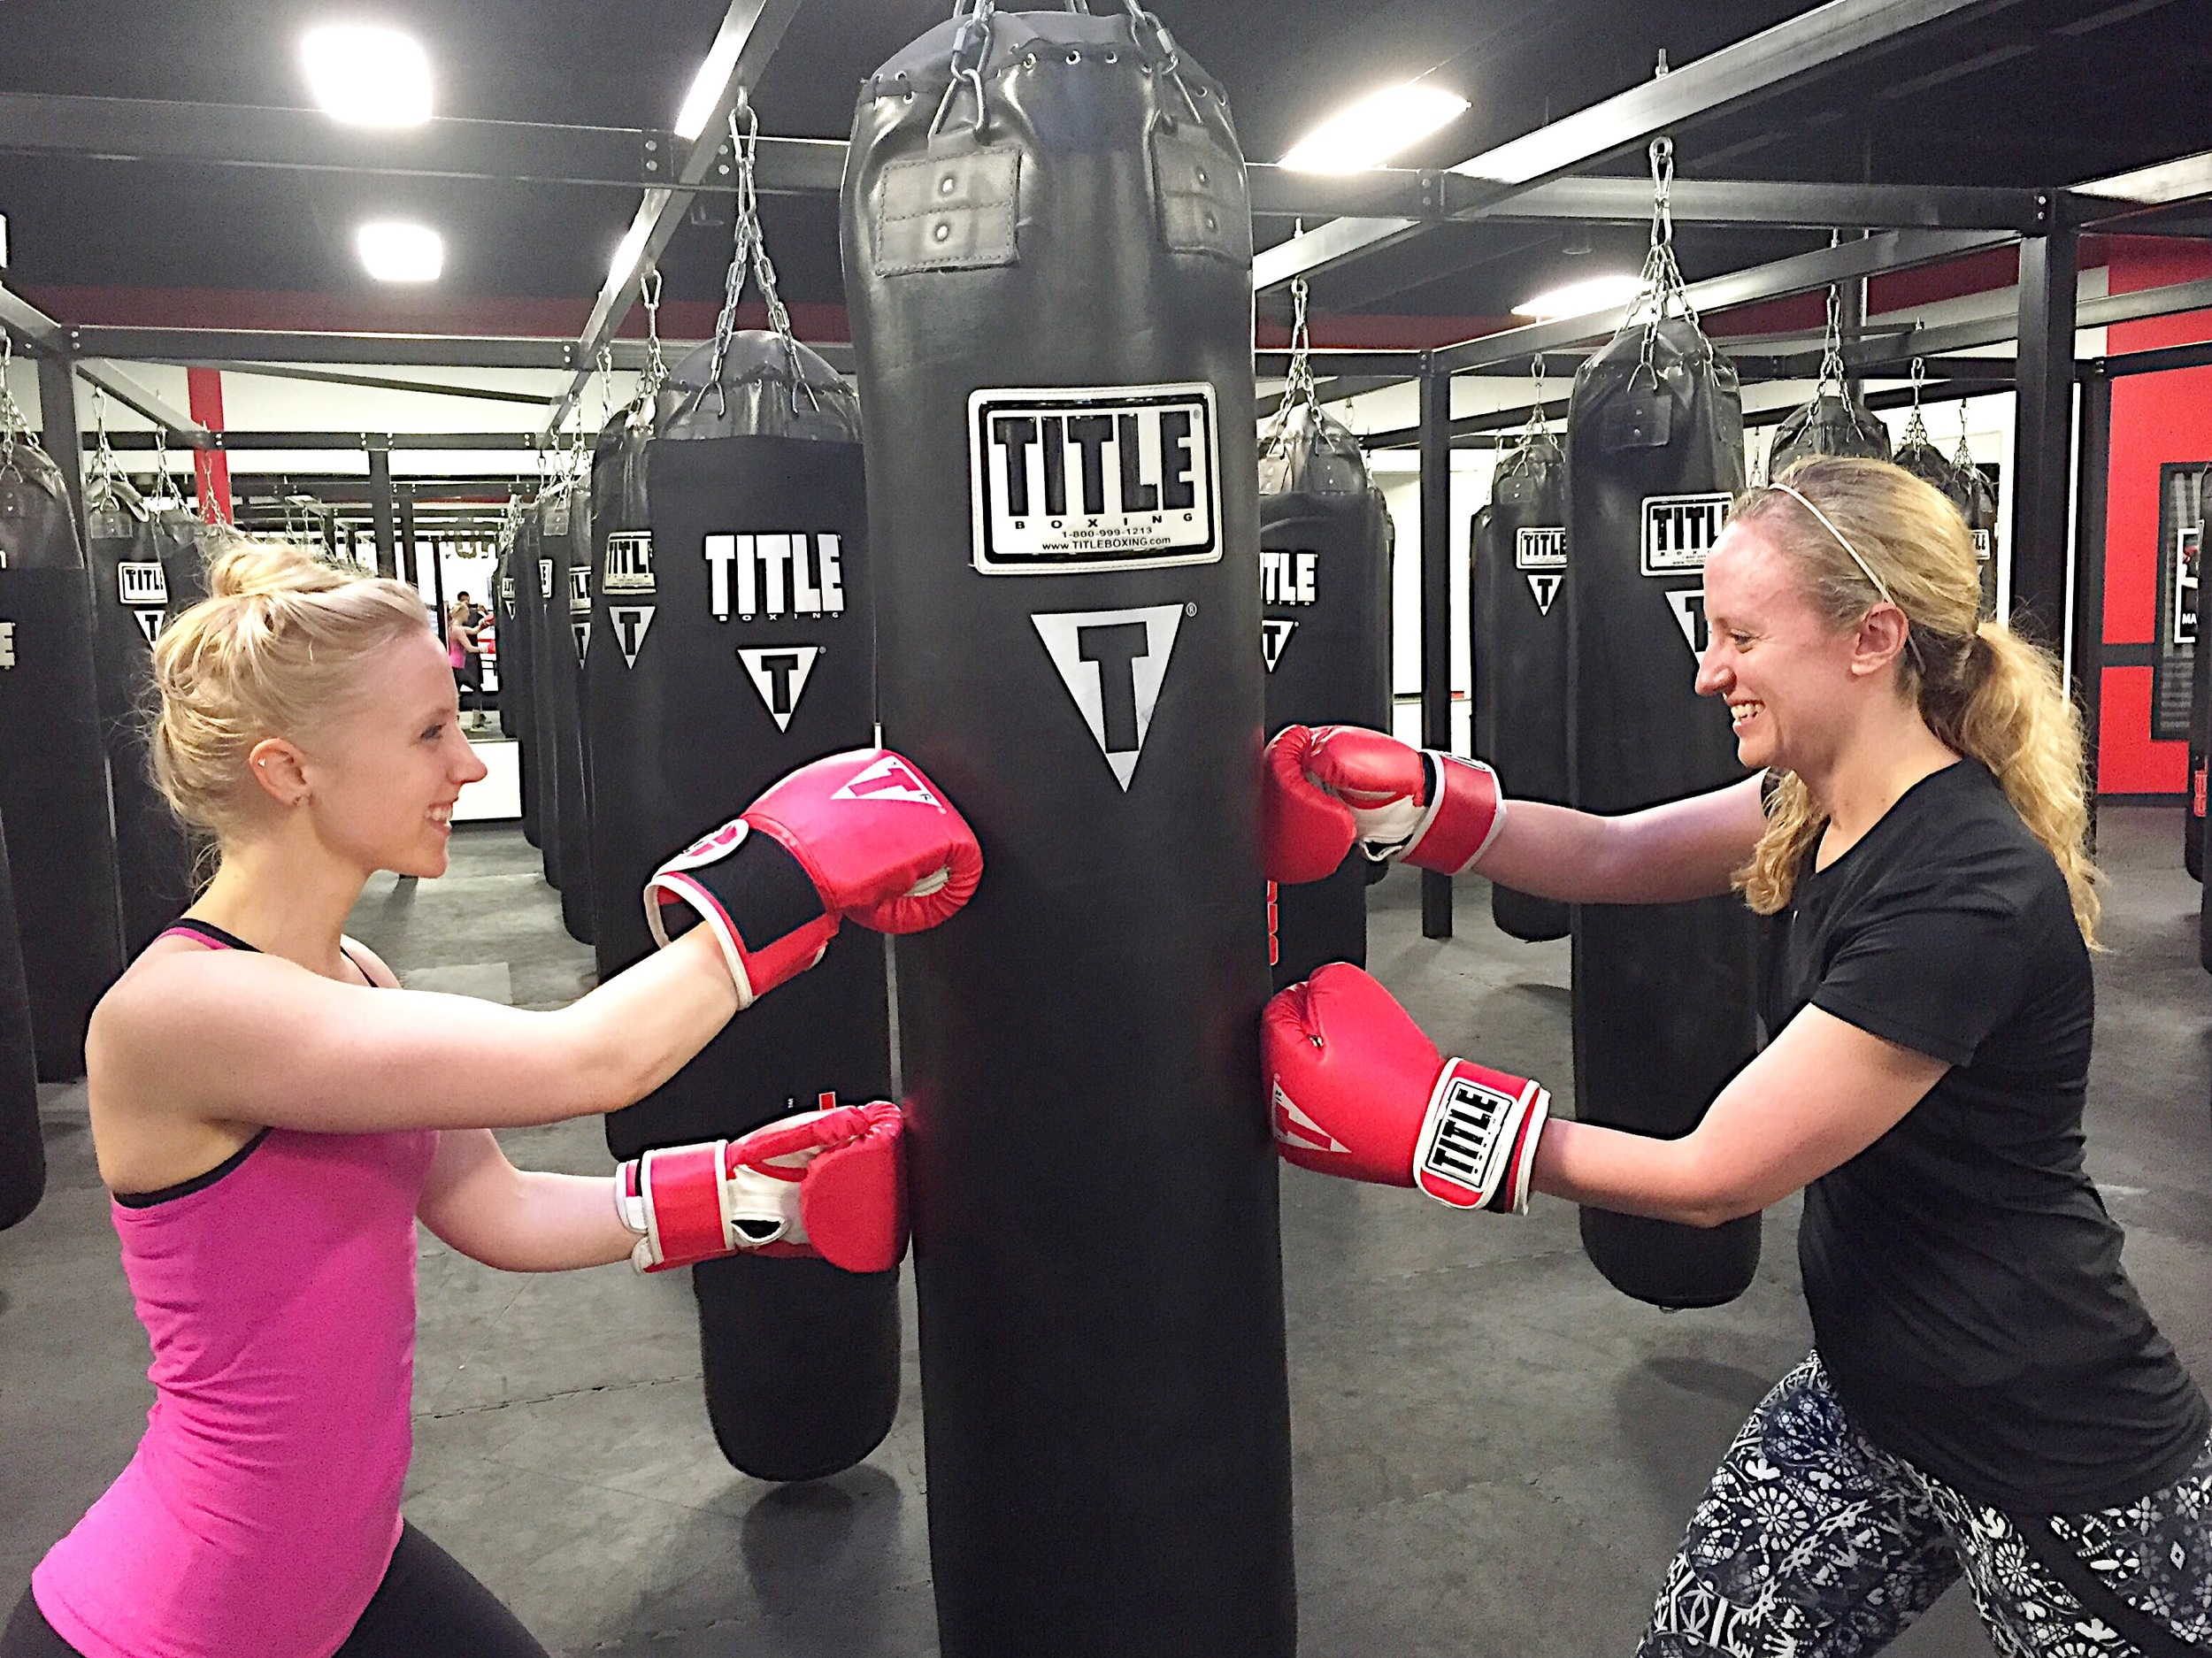 Title 9 Boxing, Kickboxing, Edina, Fitness Studio, Review,